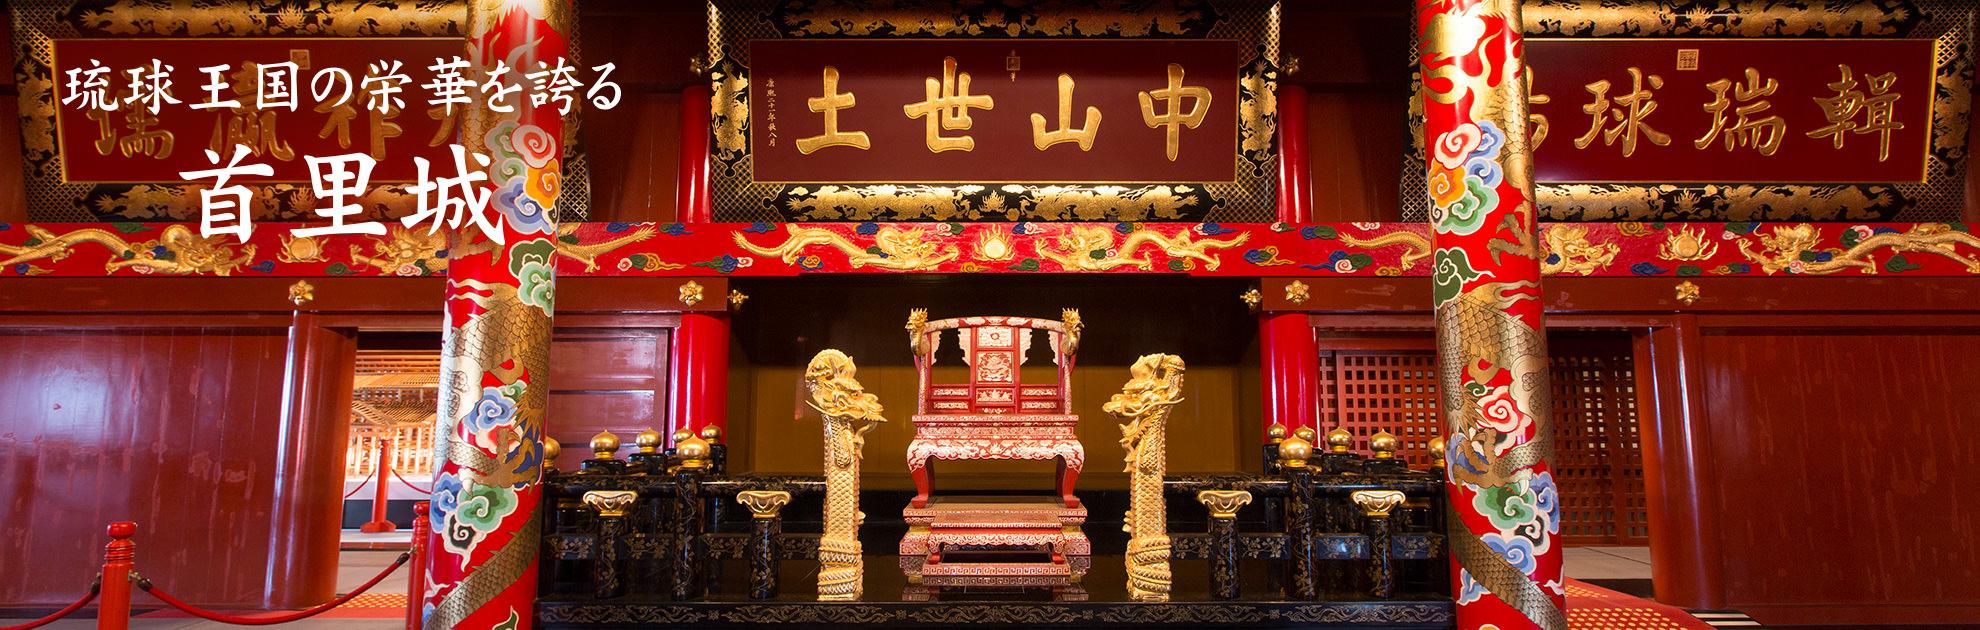 Shurijo Castle which shows glorification of Ryukyu kingdom